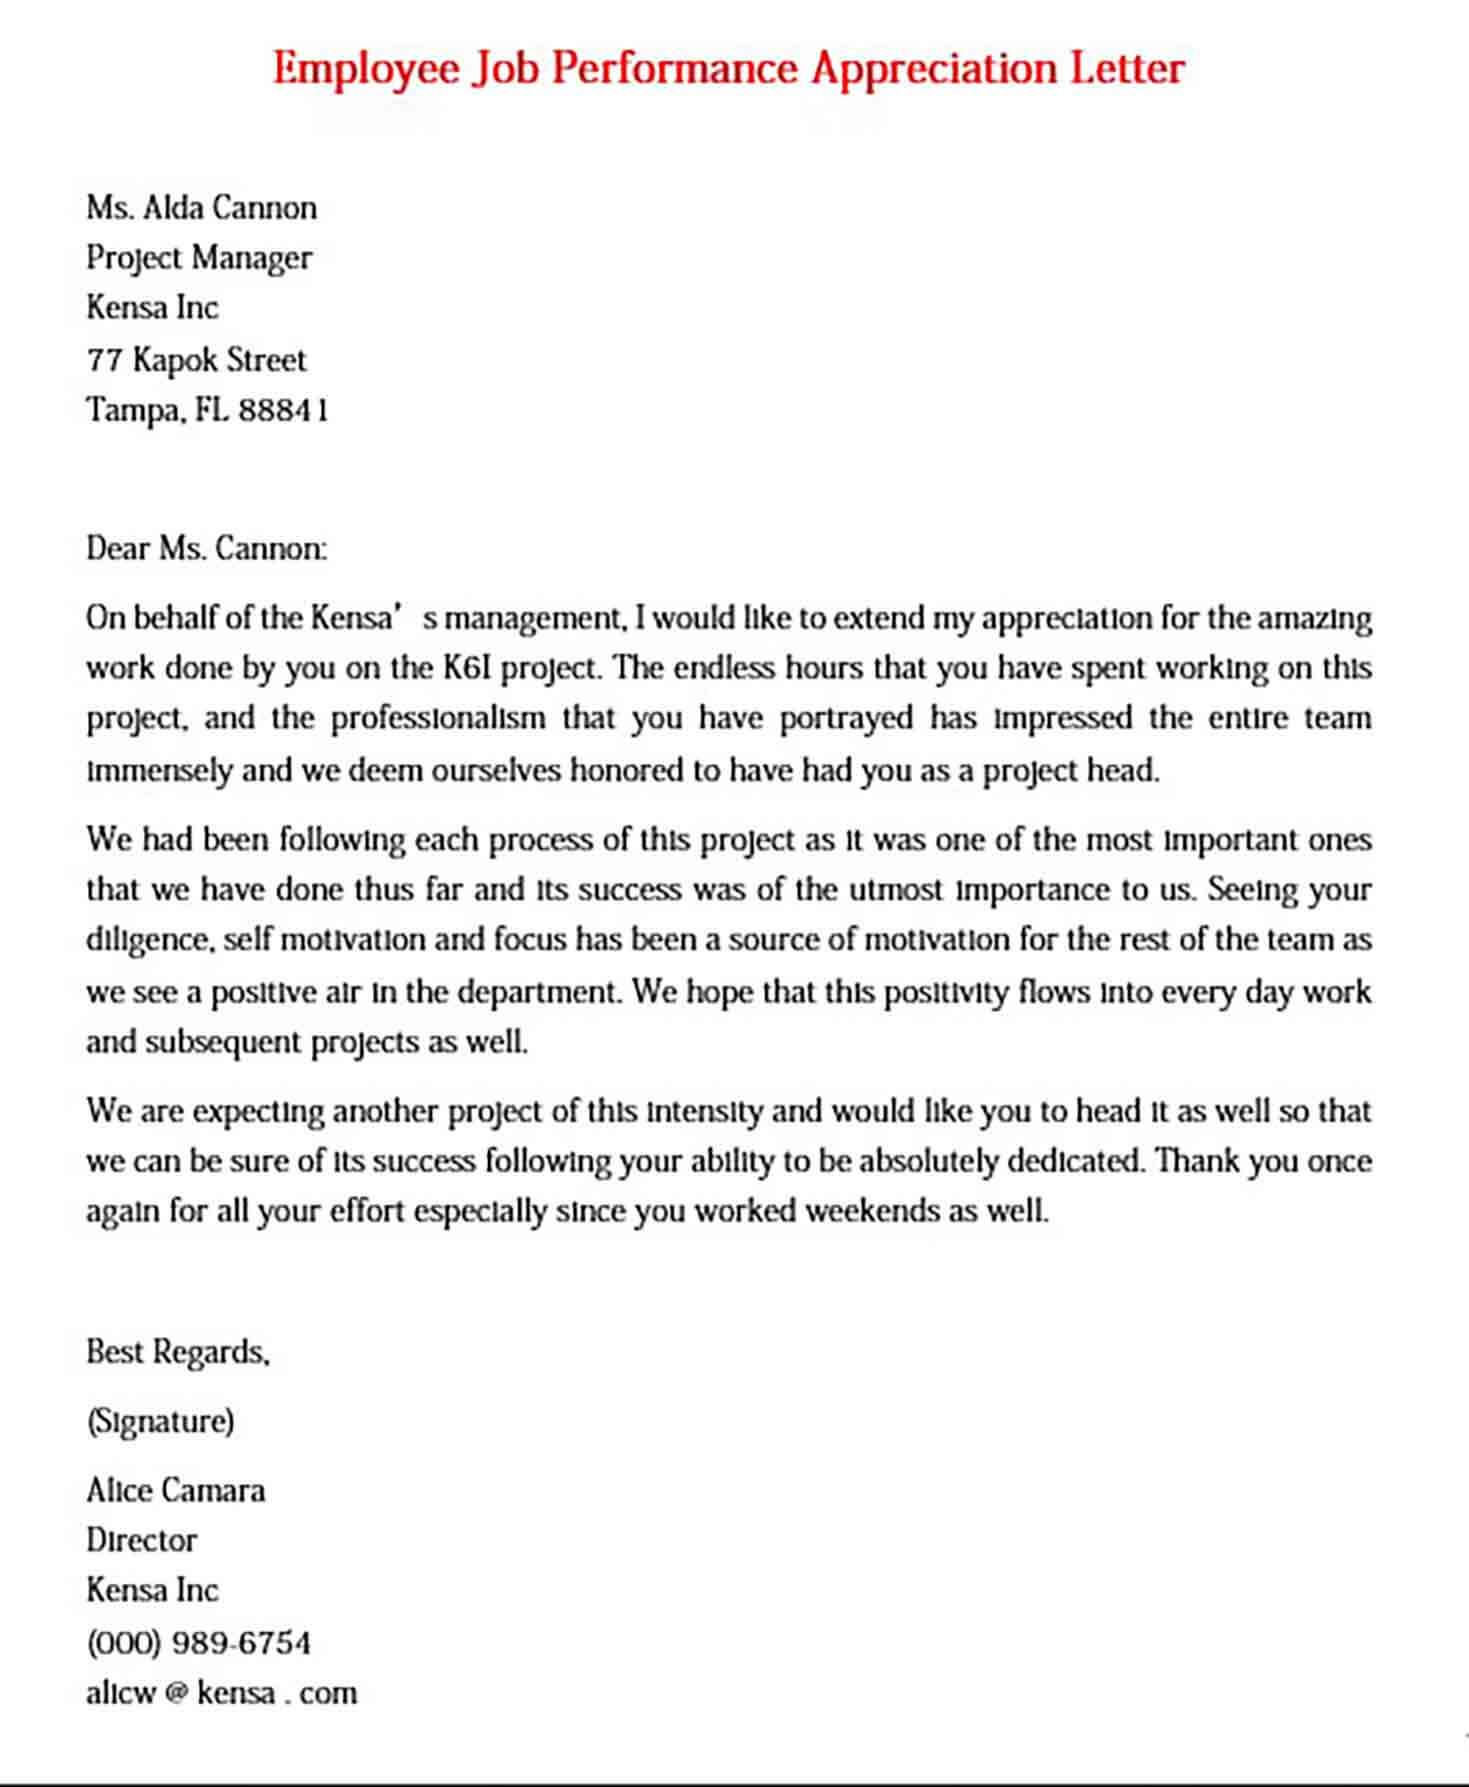 Employee Job Performance Appreciation Letter